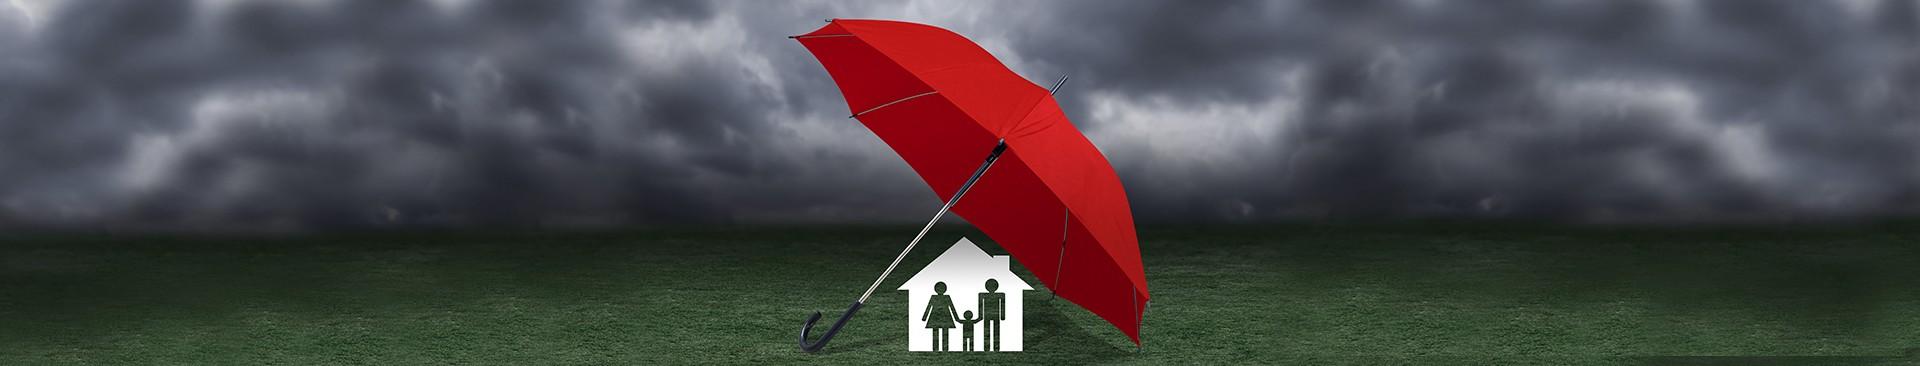 How do I know if I need umbrella coverage?